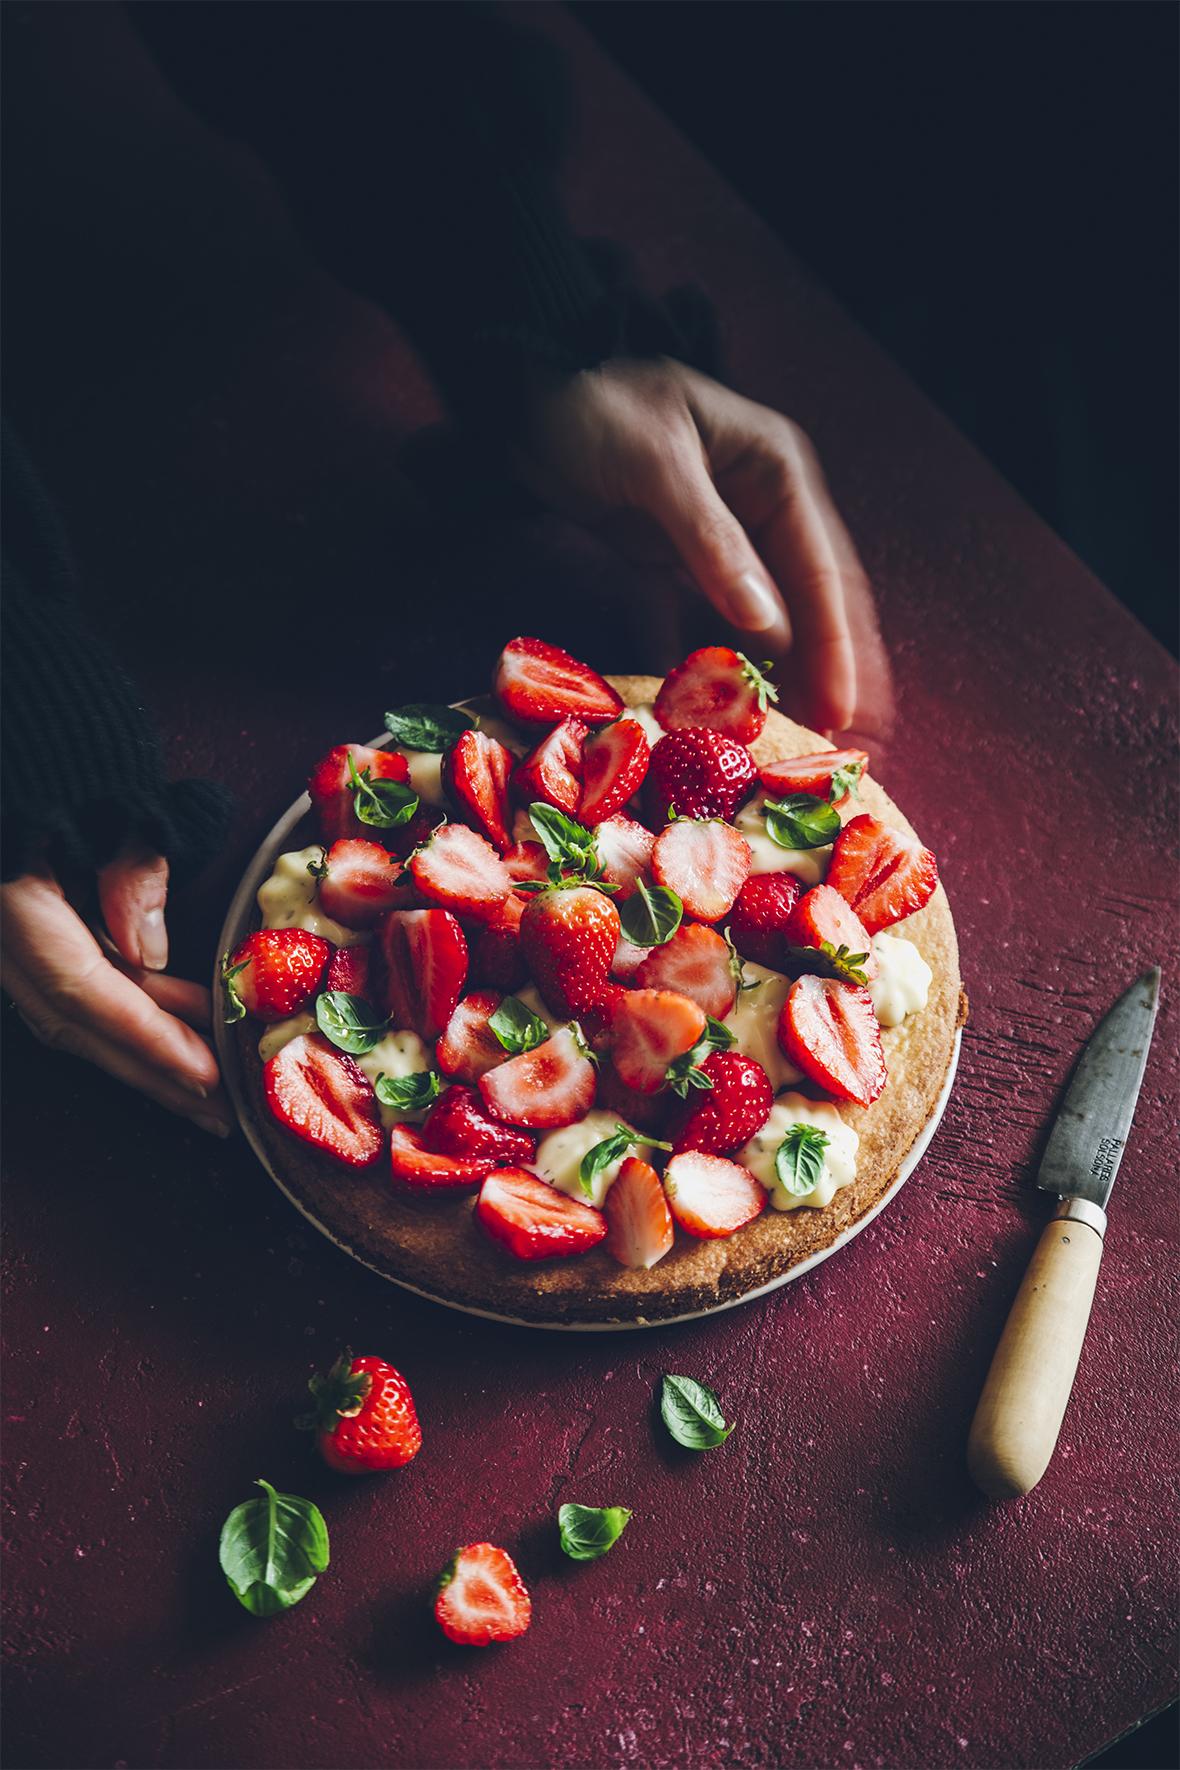 Tarte aux fraises, crémeux citron vert basilic ©Sandrine Saadi